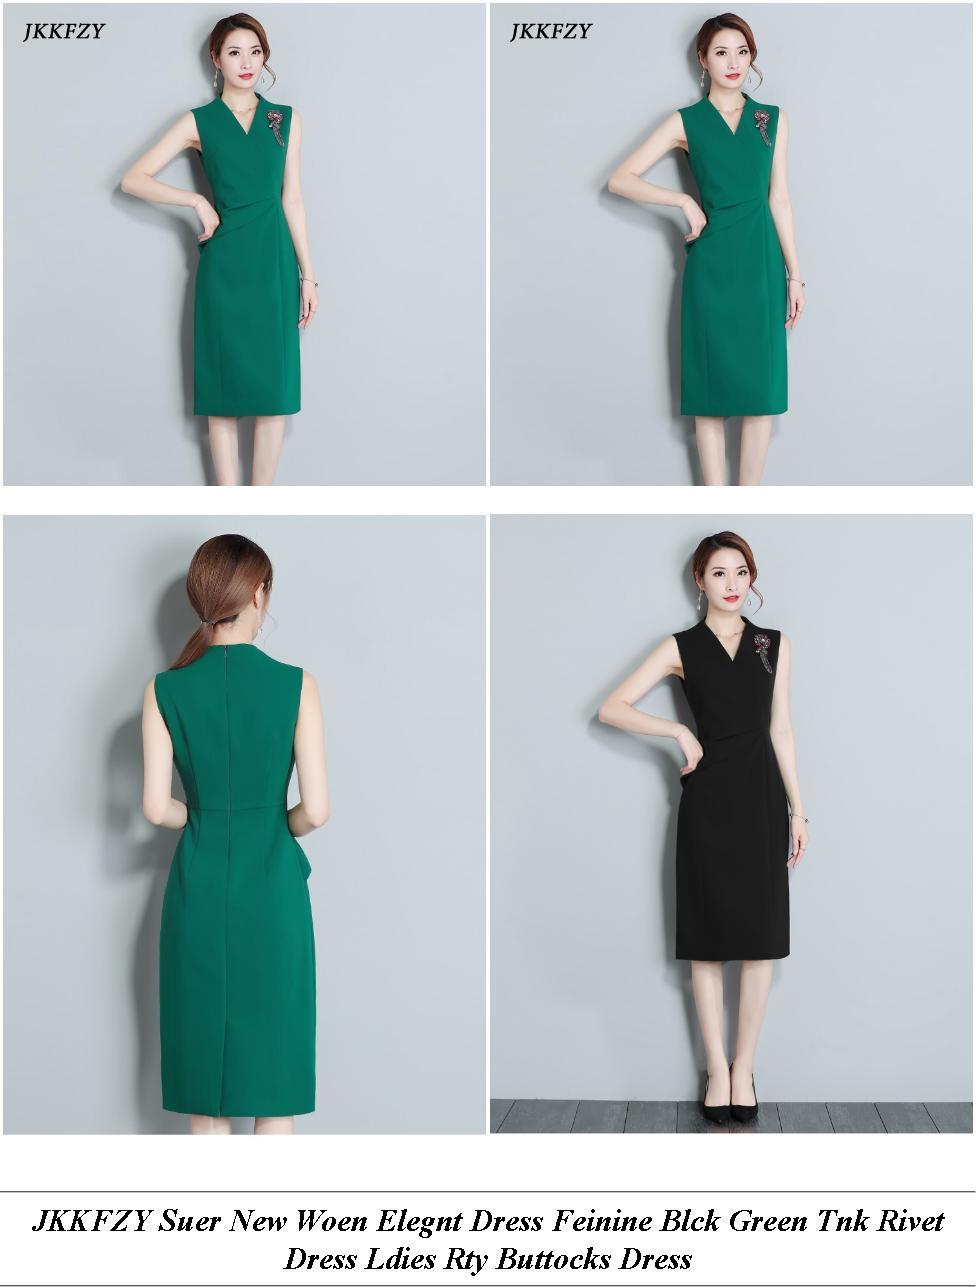 Short Prom Dresses - Converse Uk Sale - Green Dress - Cheap Clothes